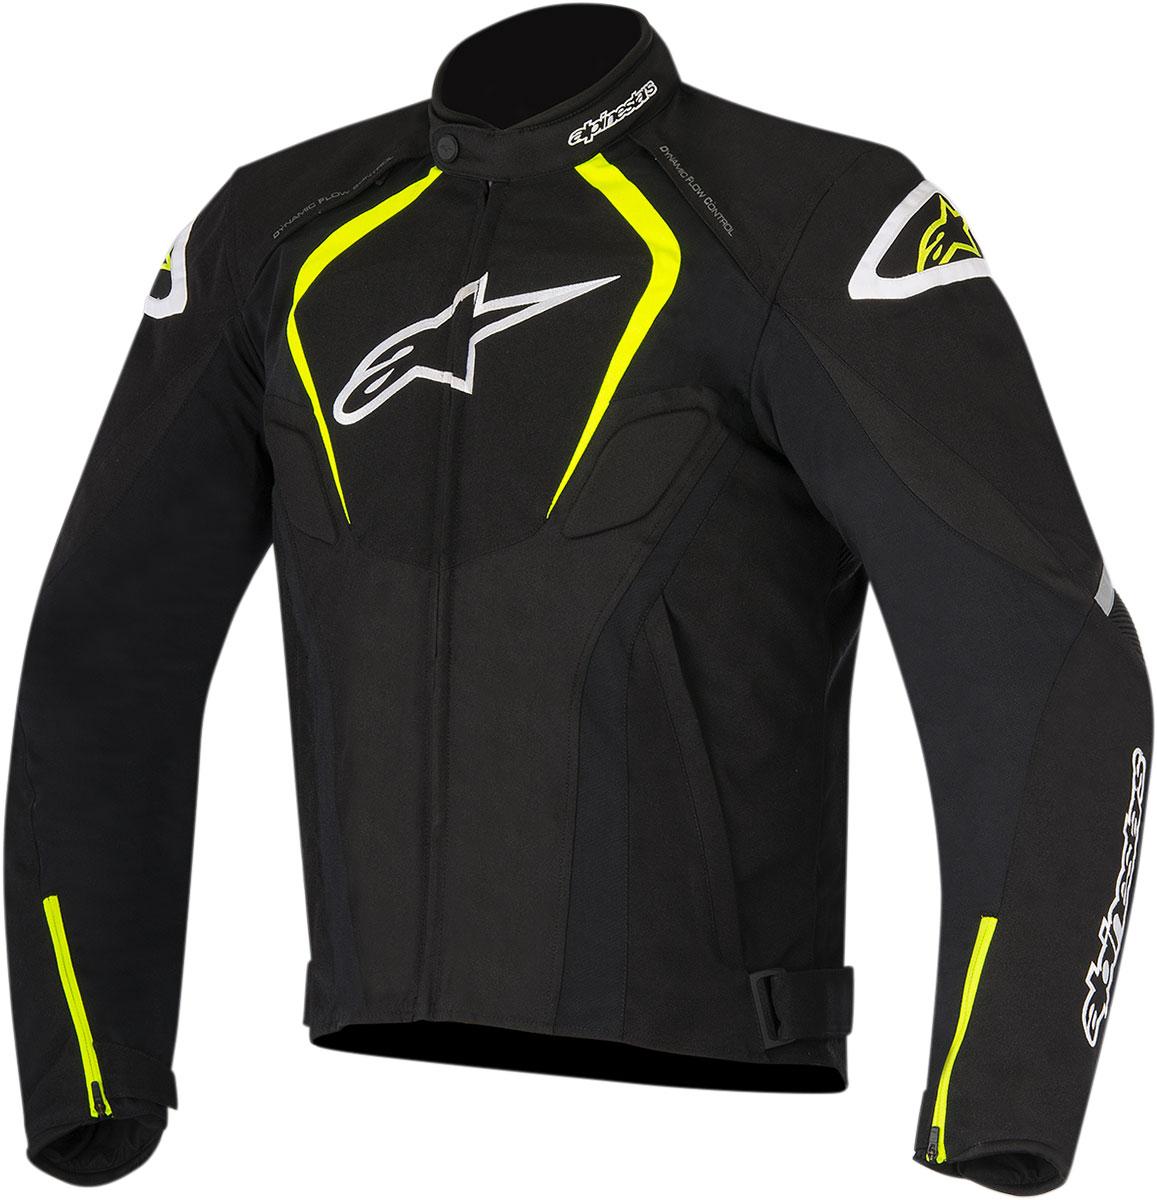 Alpinestars T-JAWS Waterproof Textile Jacket (Black/White/Yellow)